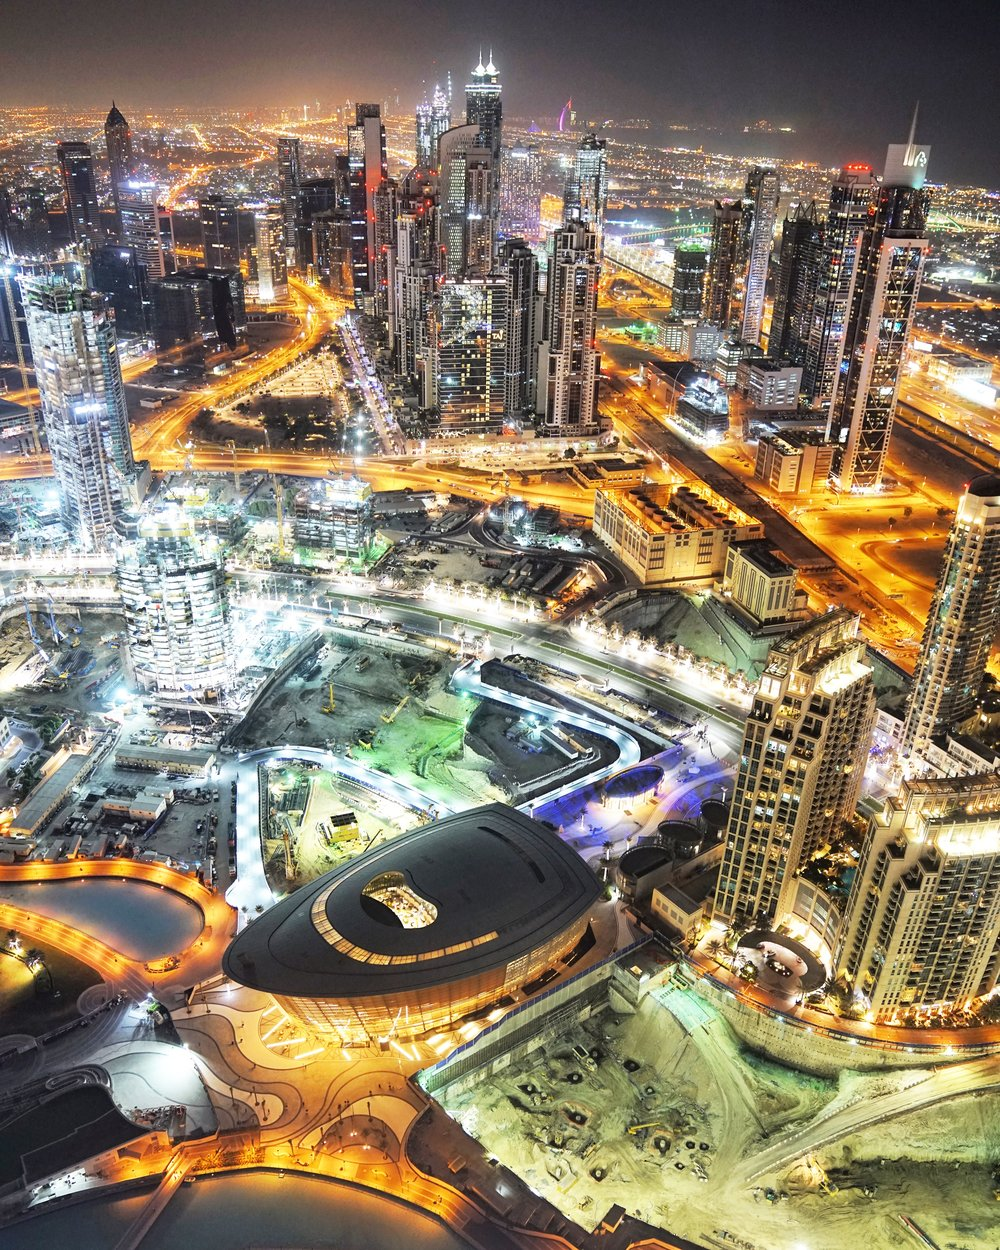 Dubai, from Burj Khalifa